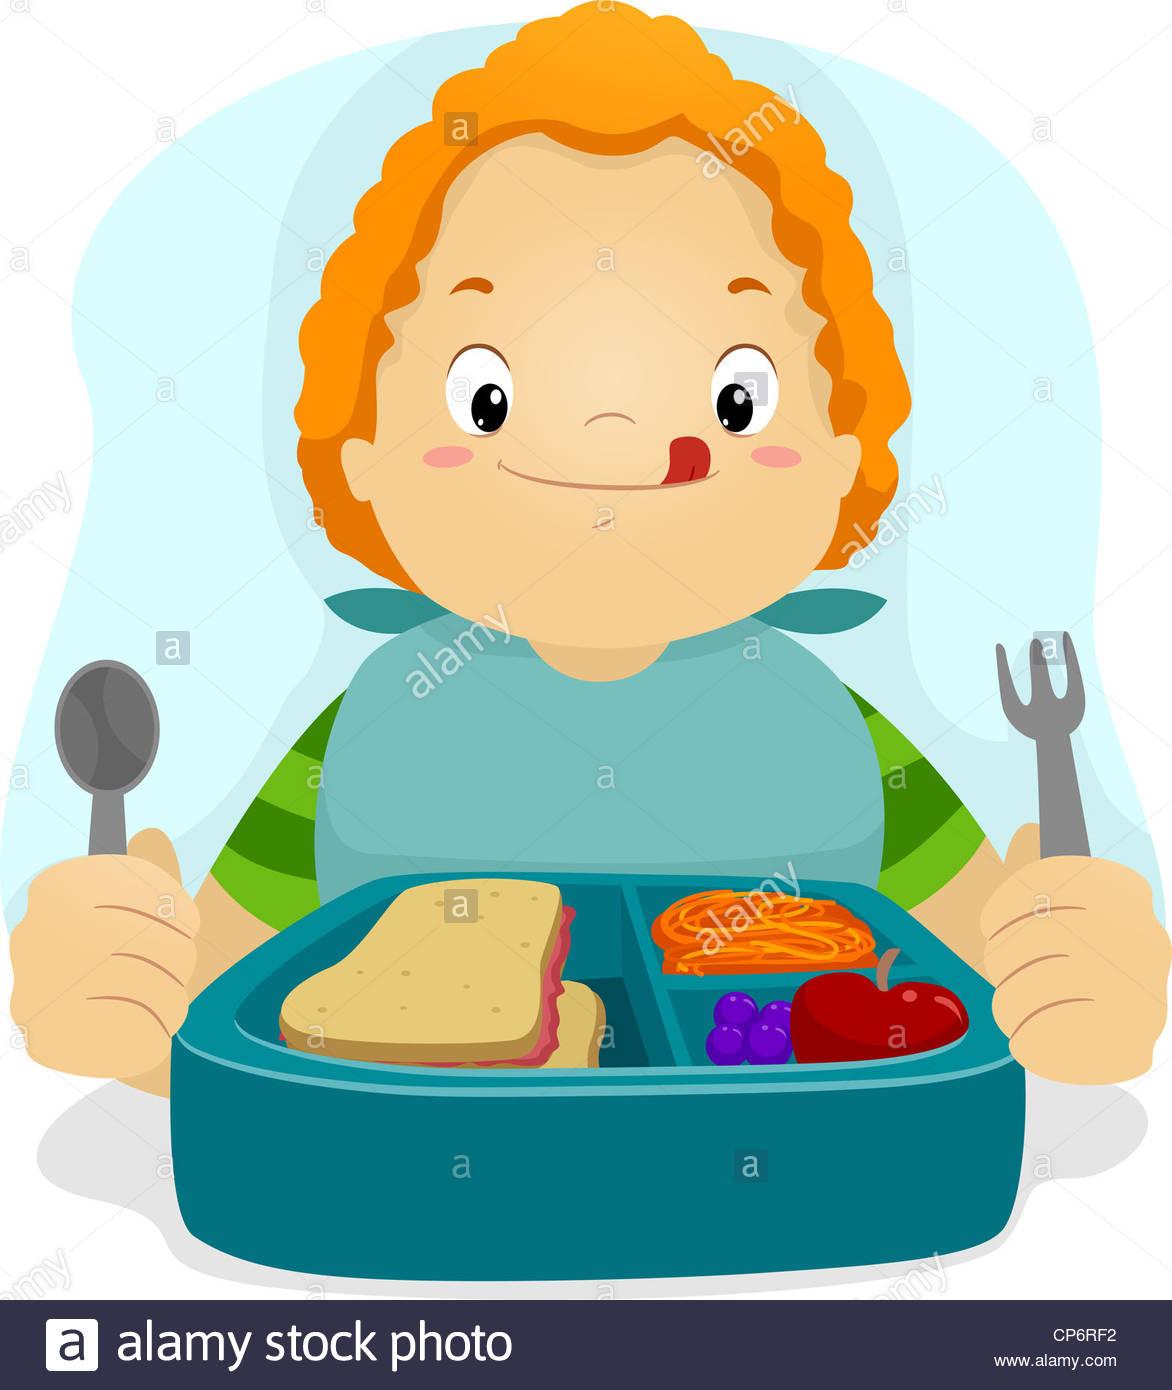 1172x1390 Cartoon Illustration Hungry Boy Stock Photos Amp Cartoon